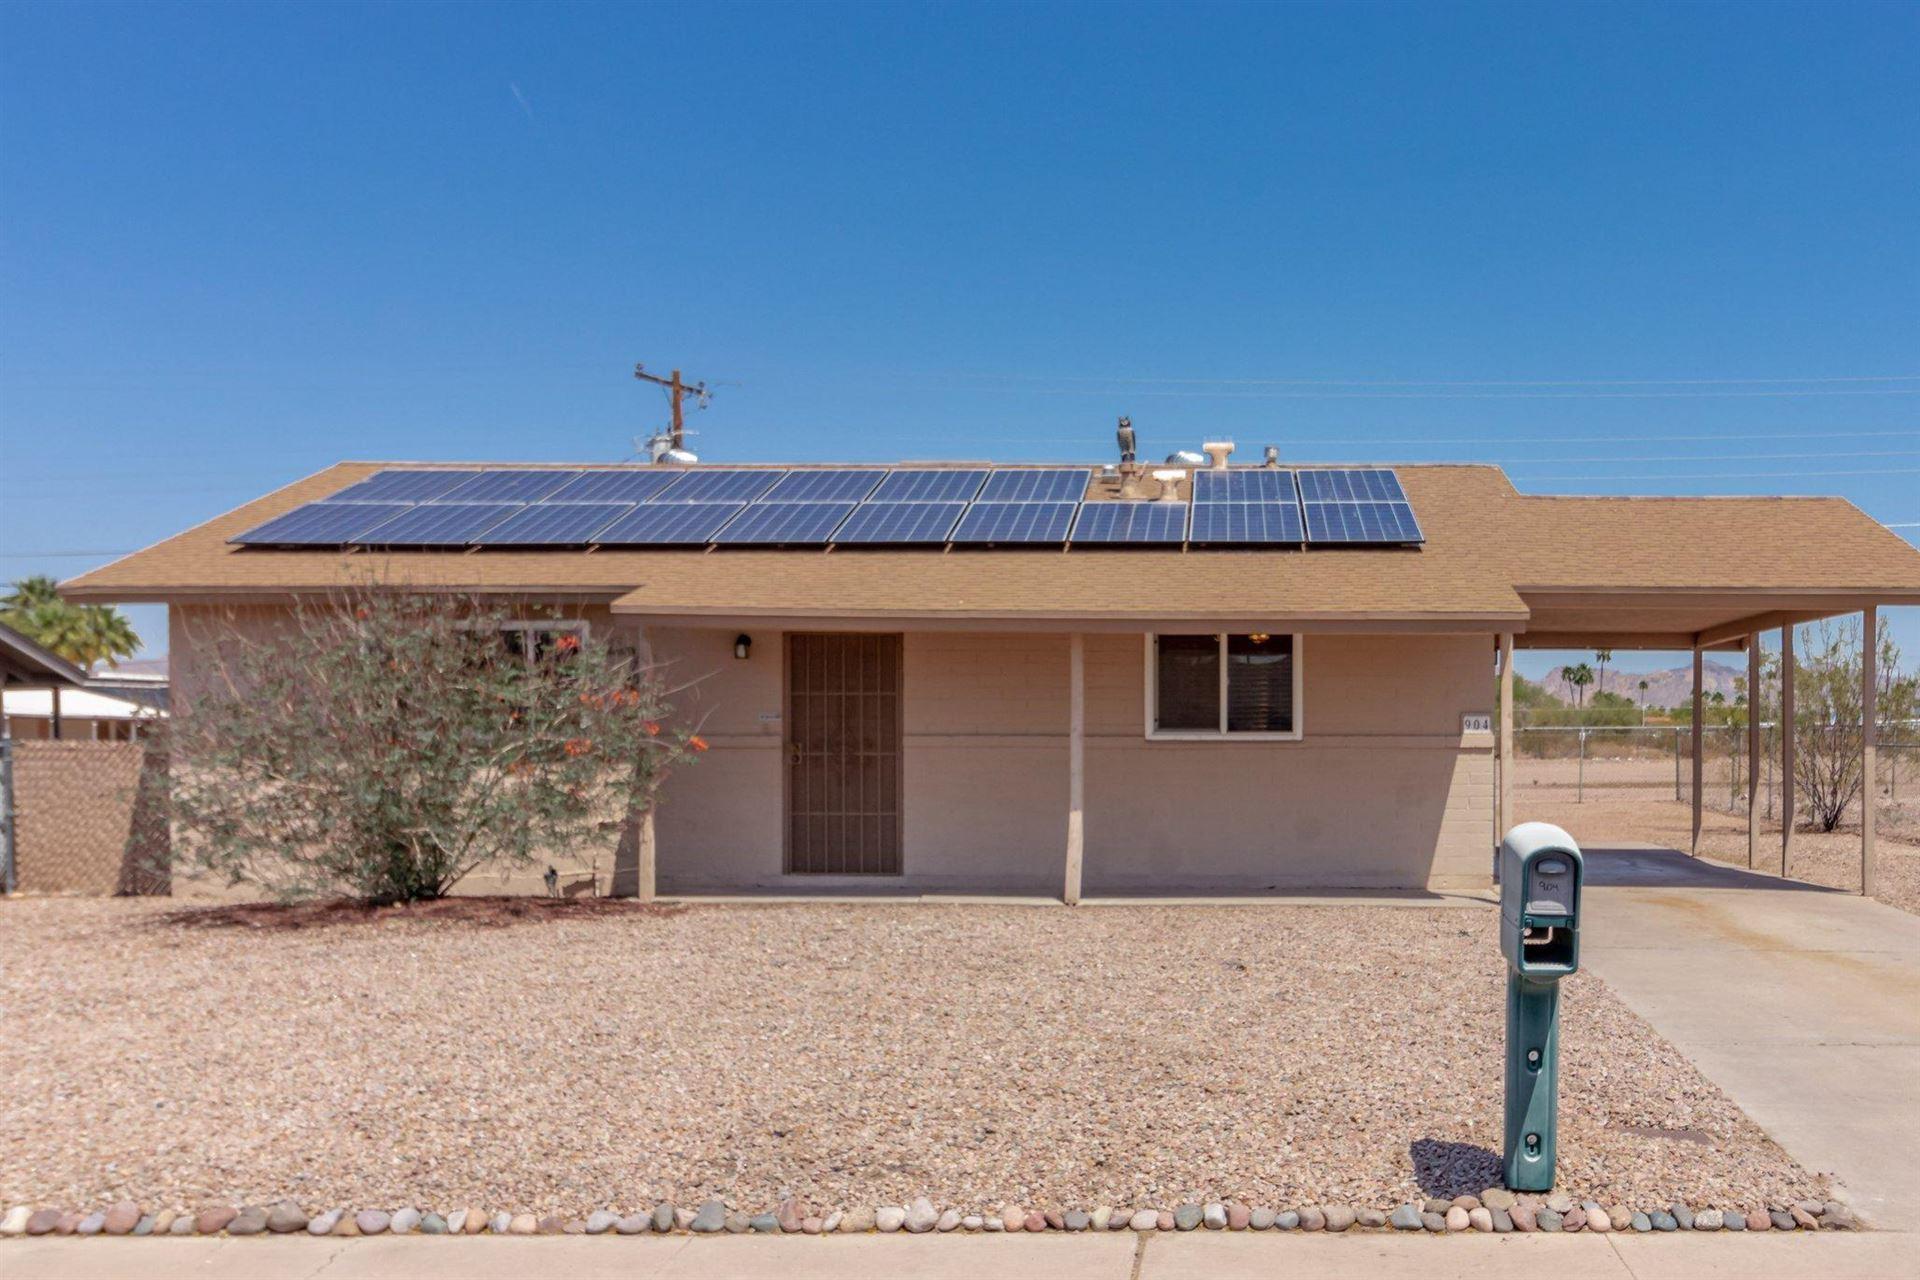 Photo of 904 W 3RD Avenue, Apache Junction, AZ 85120 (MLS # 6229539)